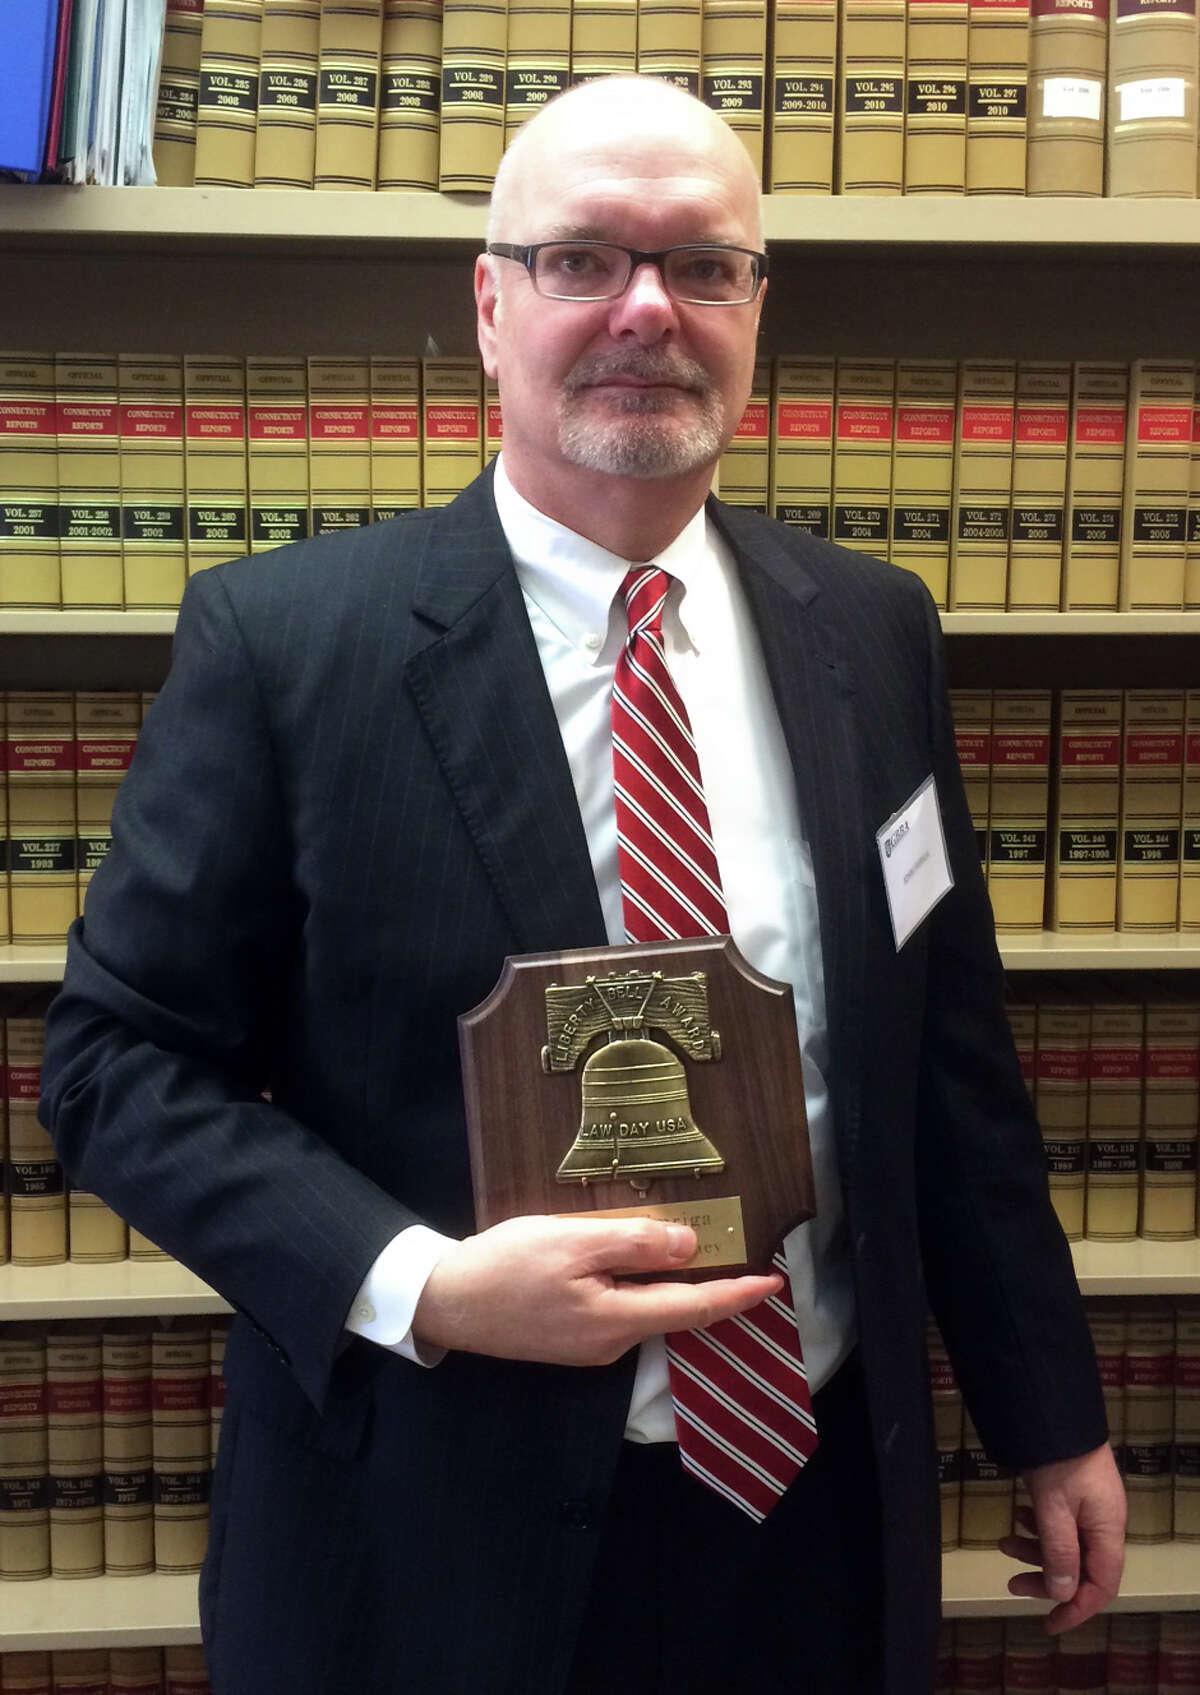 State's Attorney John Smriga received the Greater Bridgeport Bar Association's Liberty Bell Award Friday.